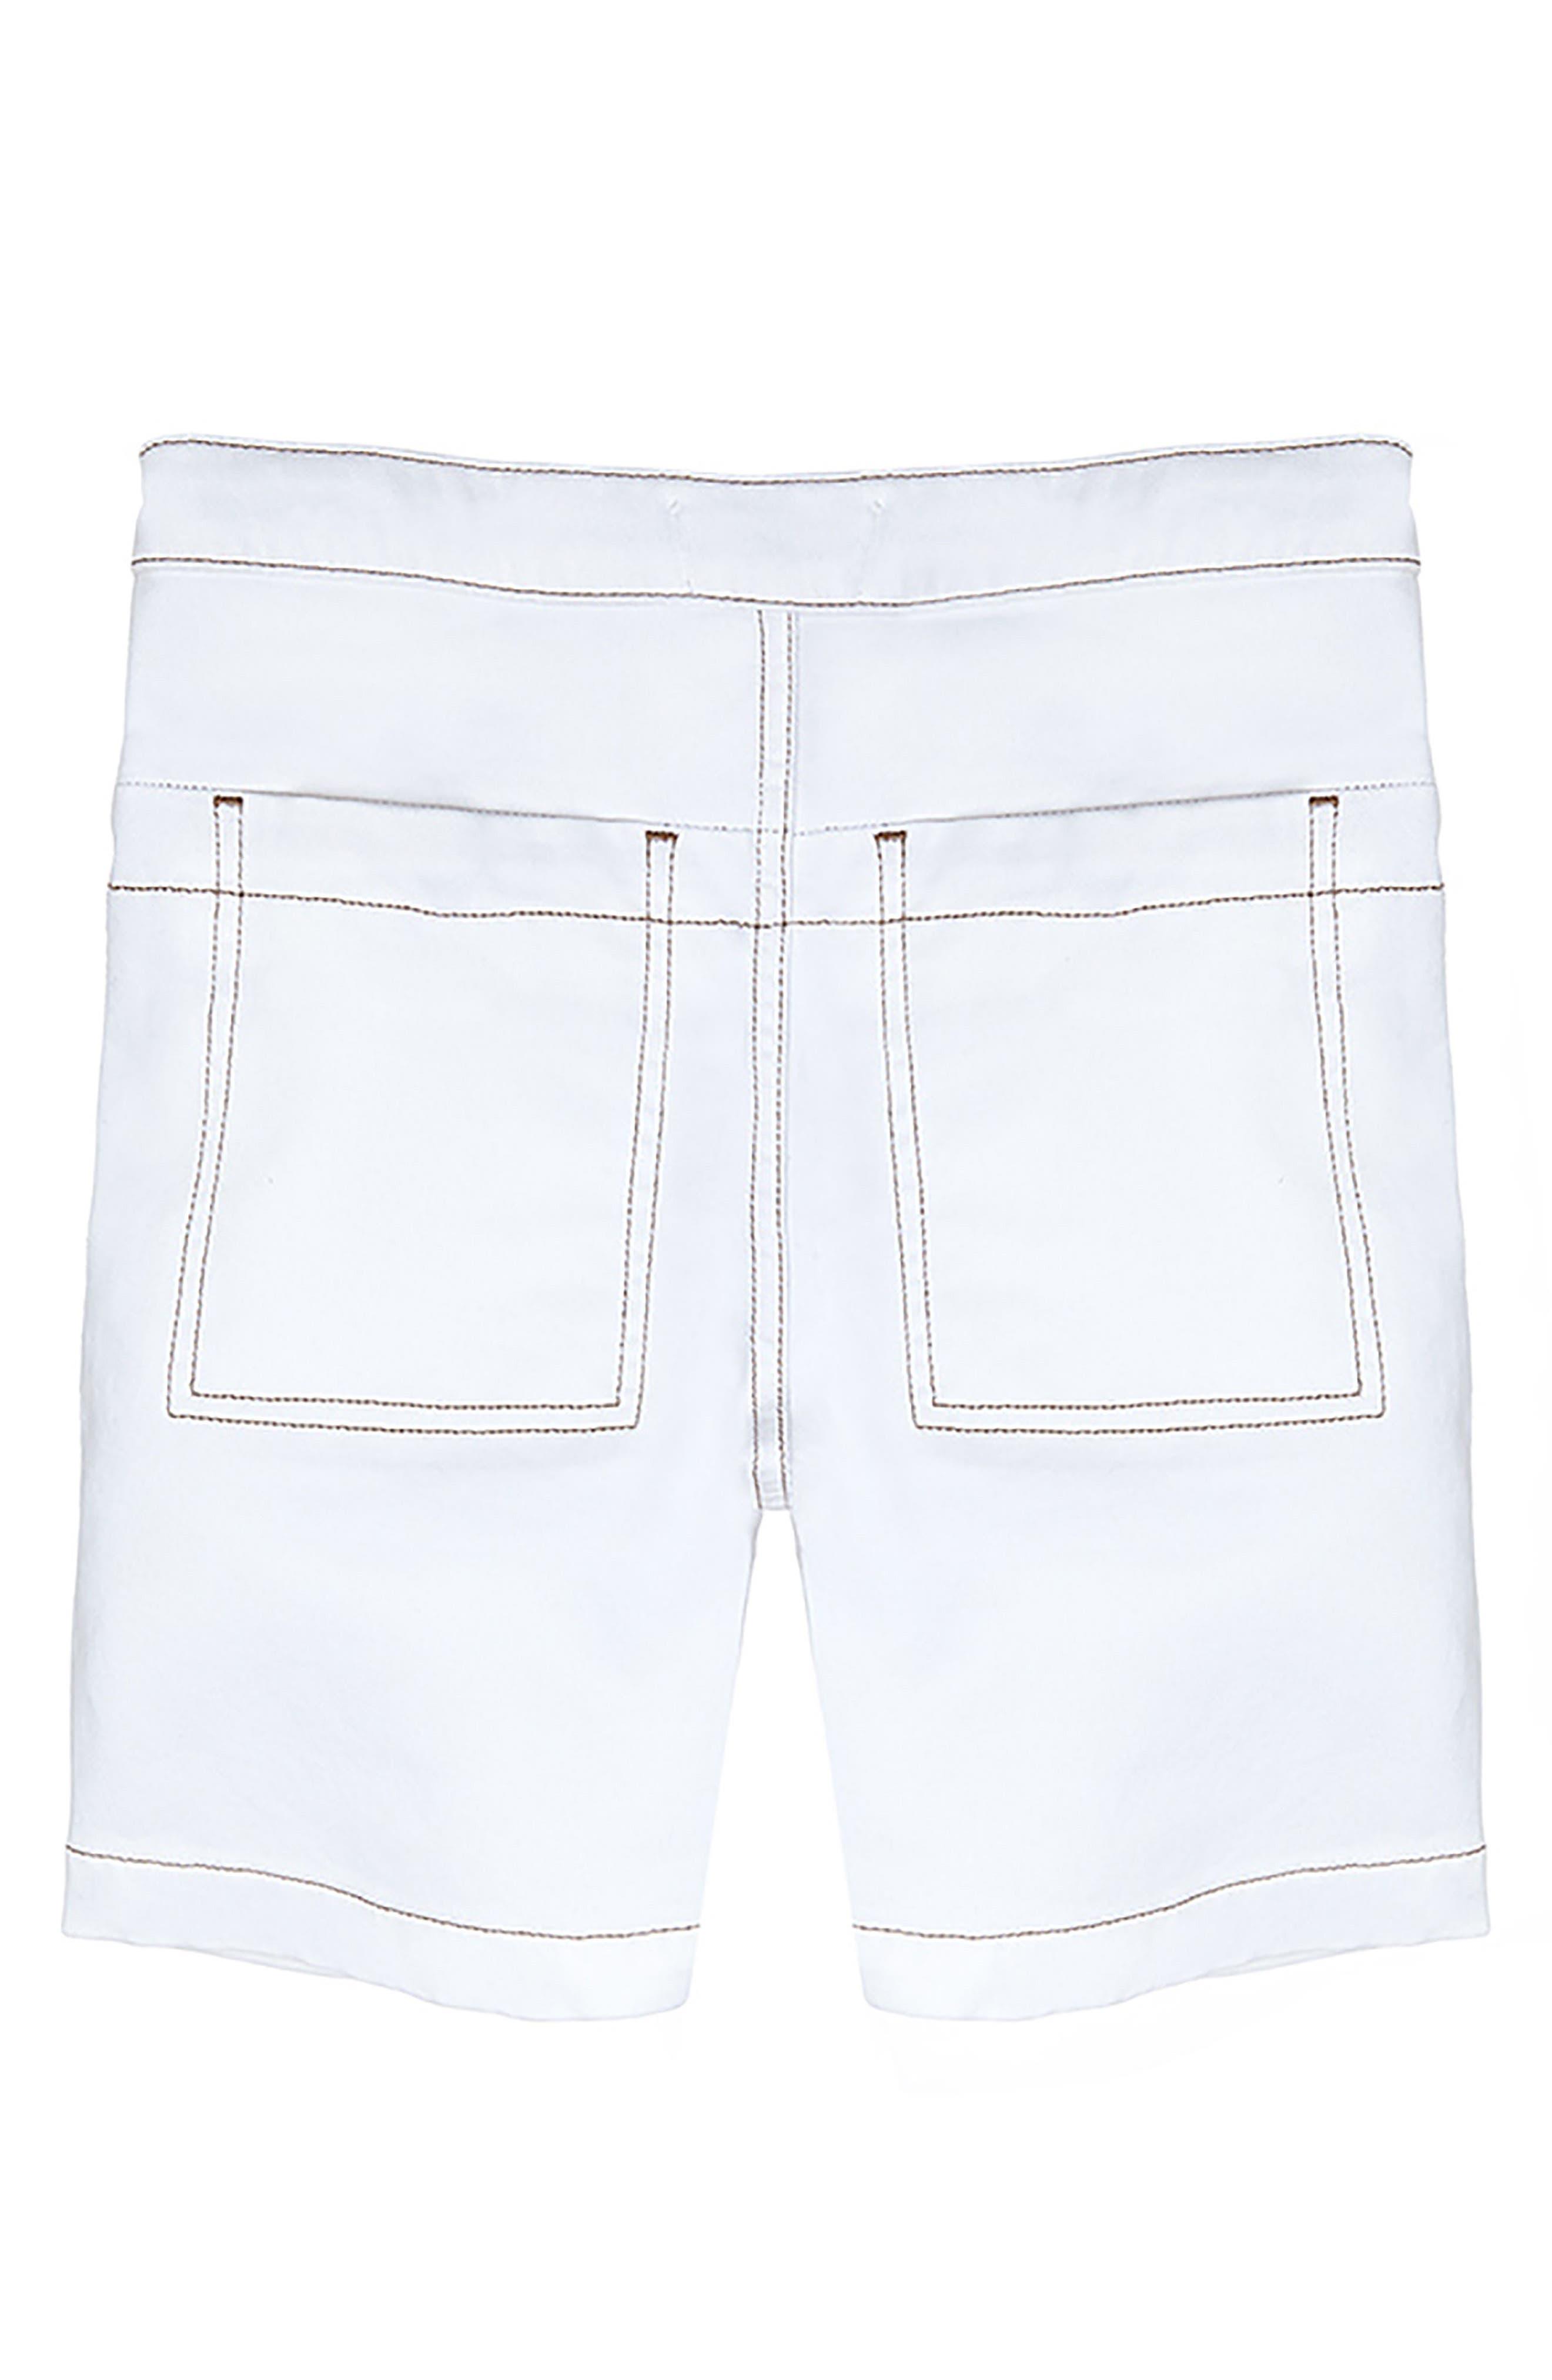 Jax Utility Shorts,                             Alternate thumbnail 2, color,                             100